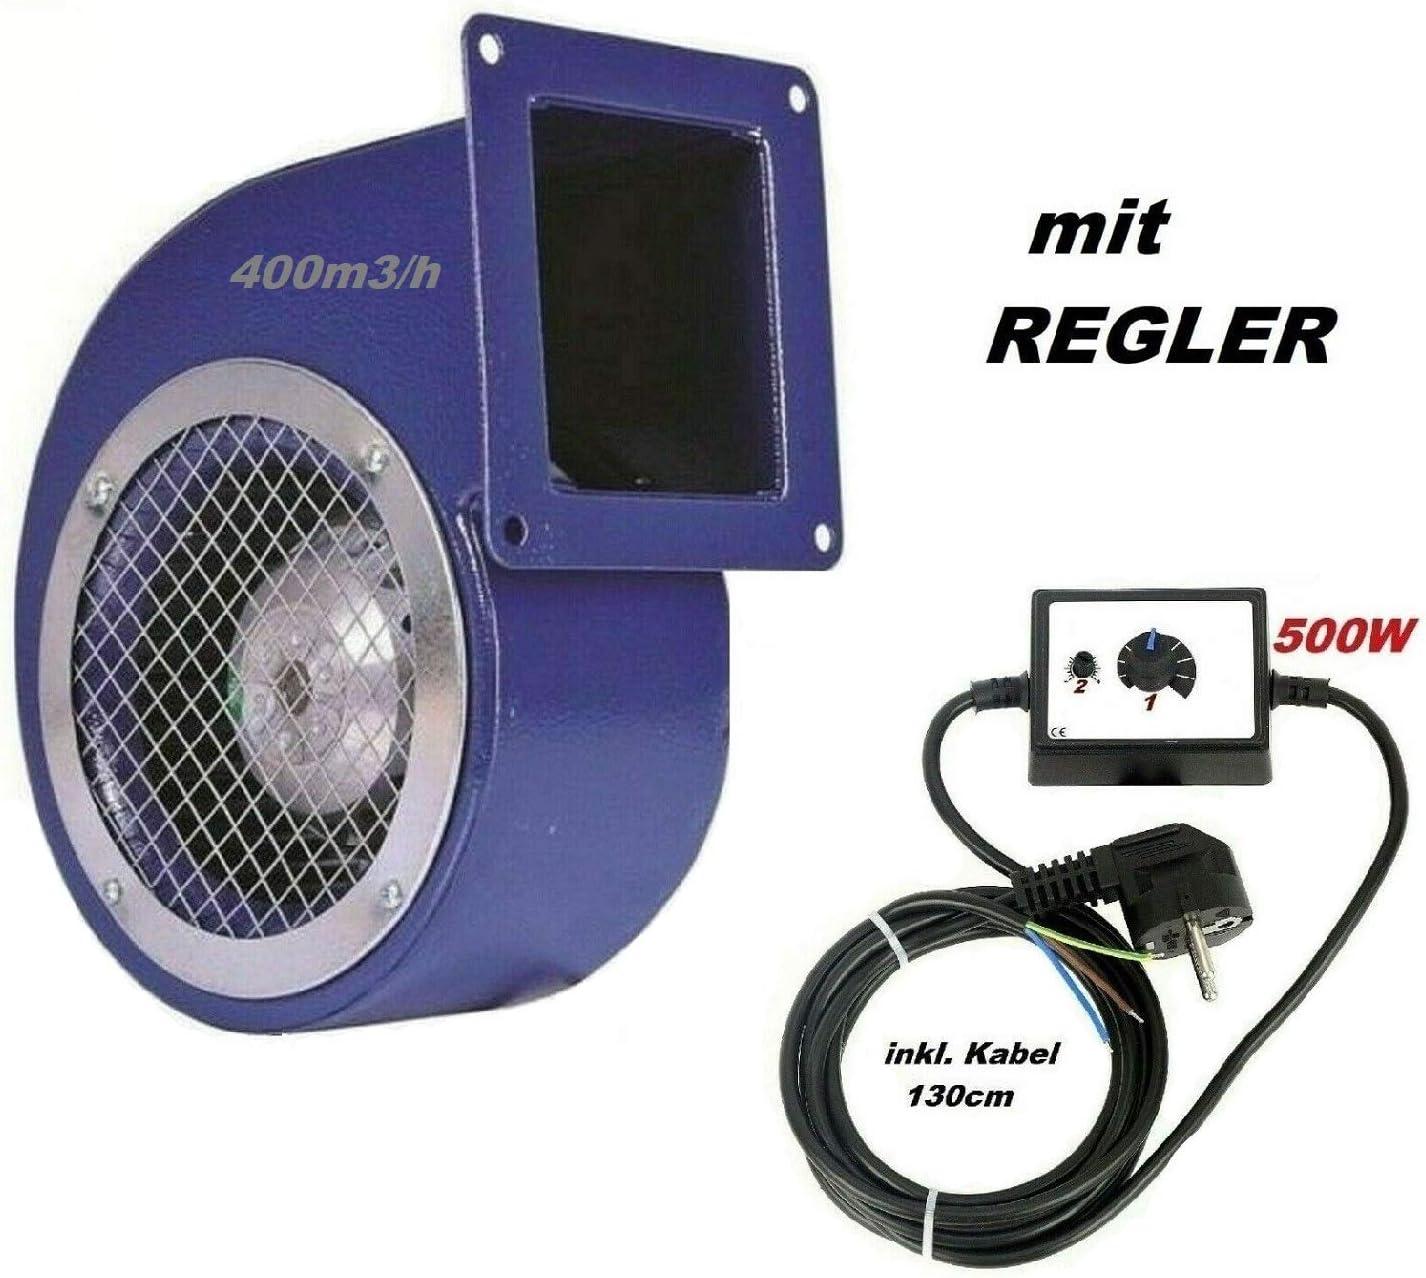 Ventilador 1200m3/h con 500W Regulador de Velocidat Ventilación centrifugo centrifuga Ventiladores Extractores